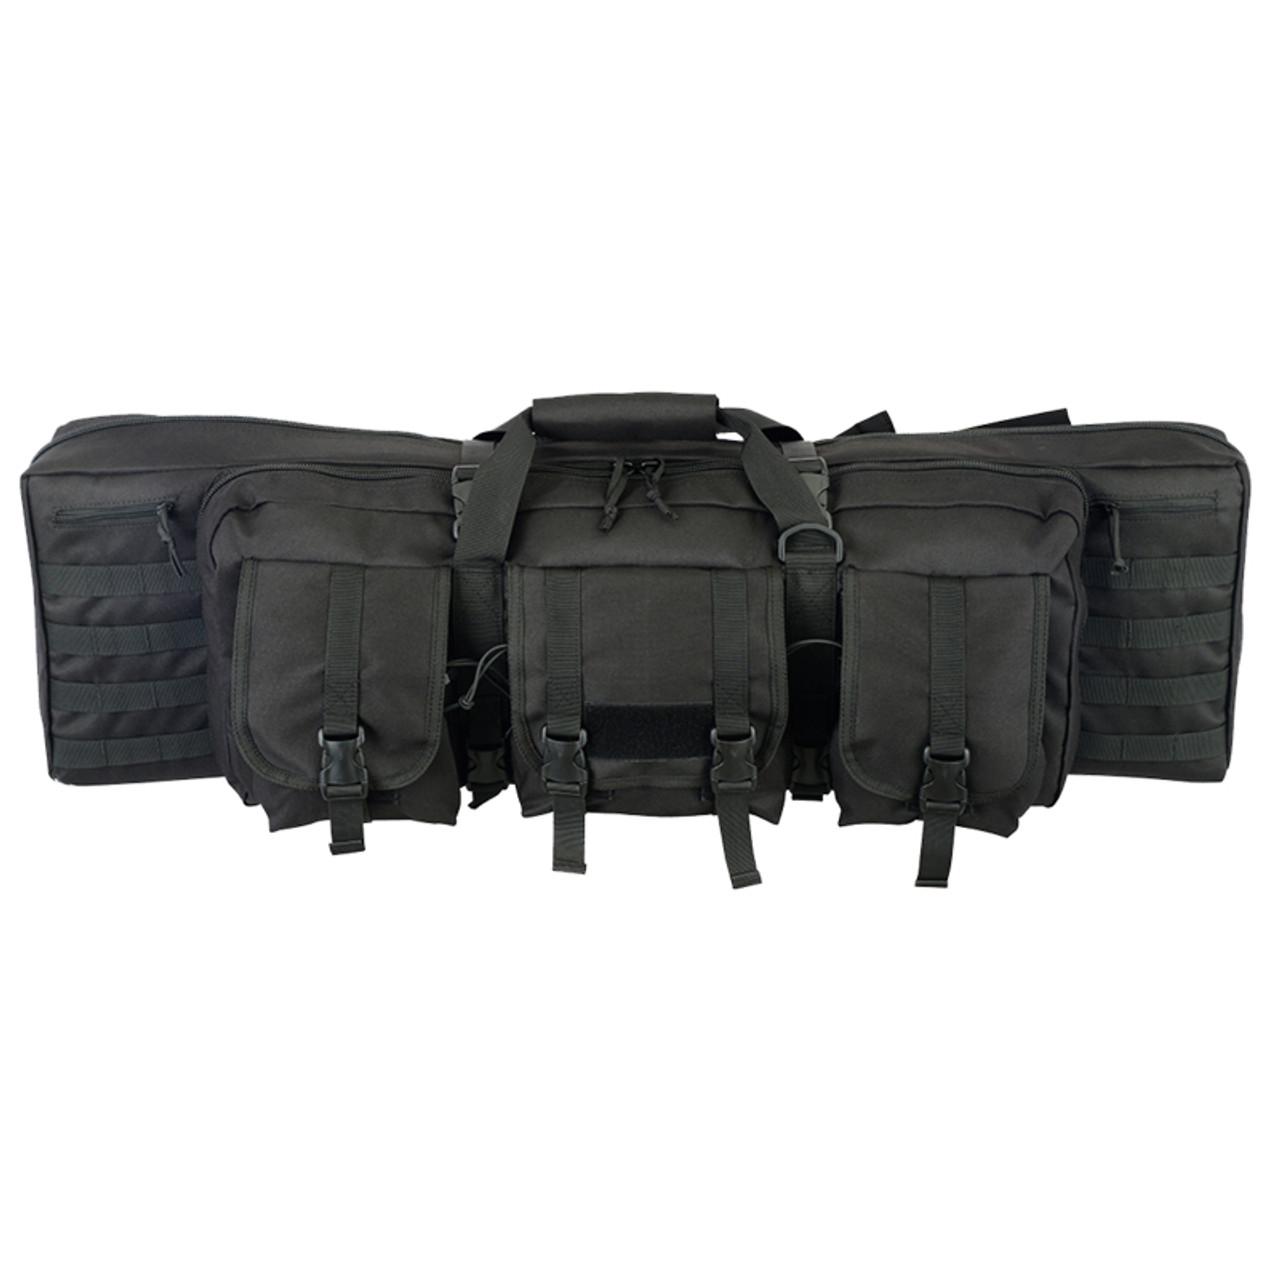 Shadow Elite Double Rifle Bag